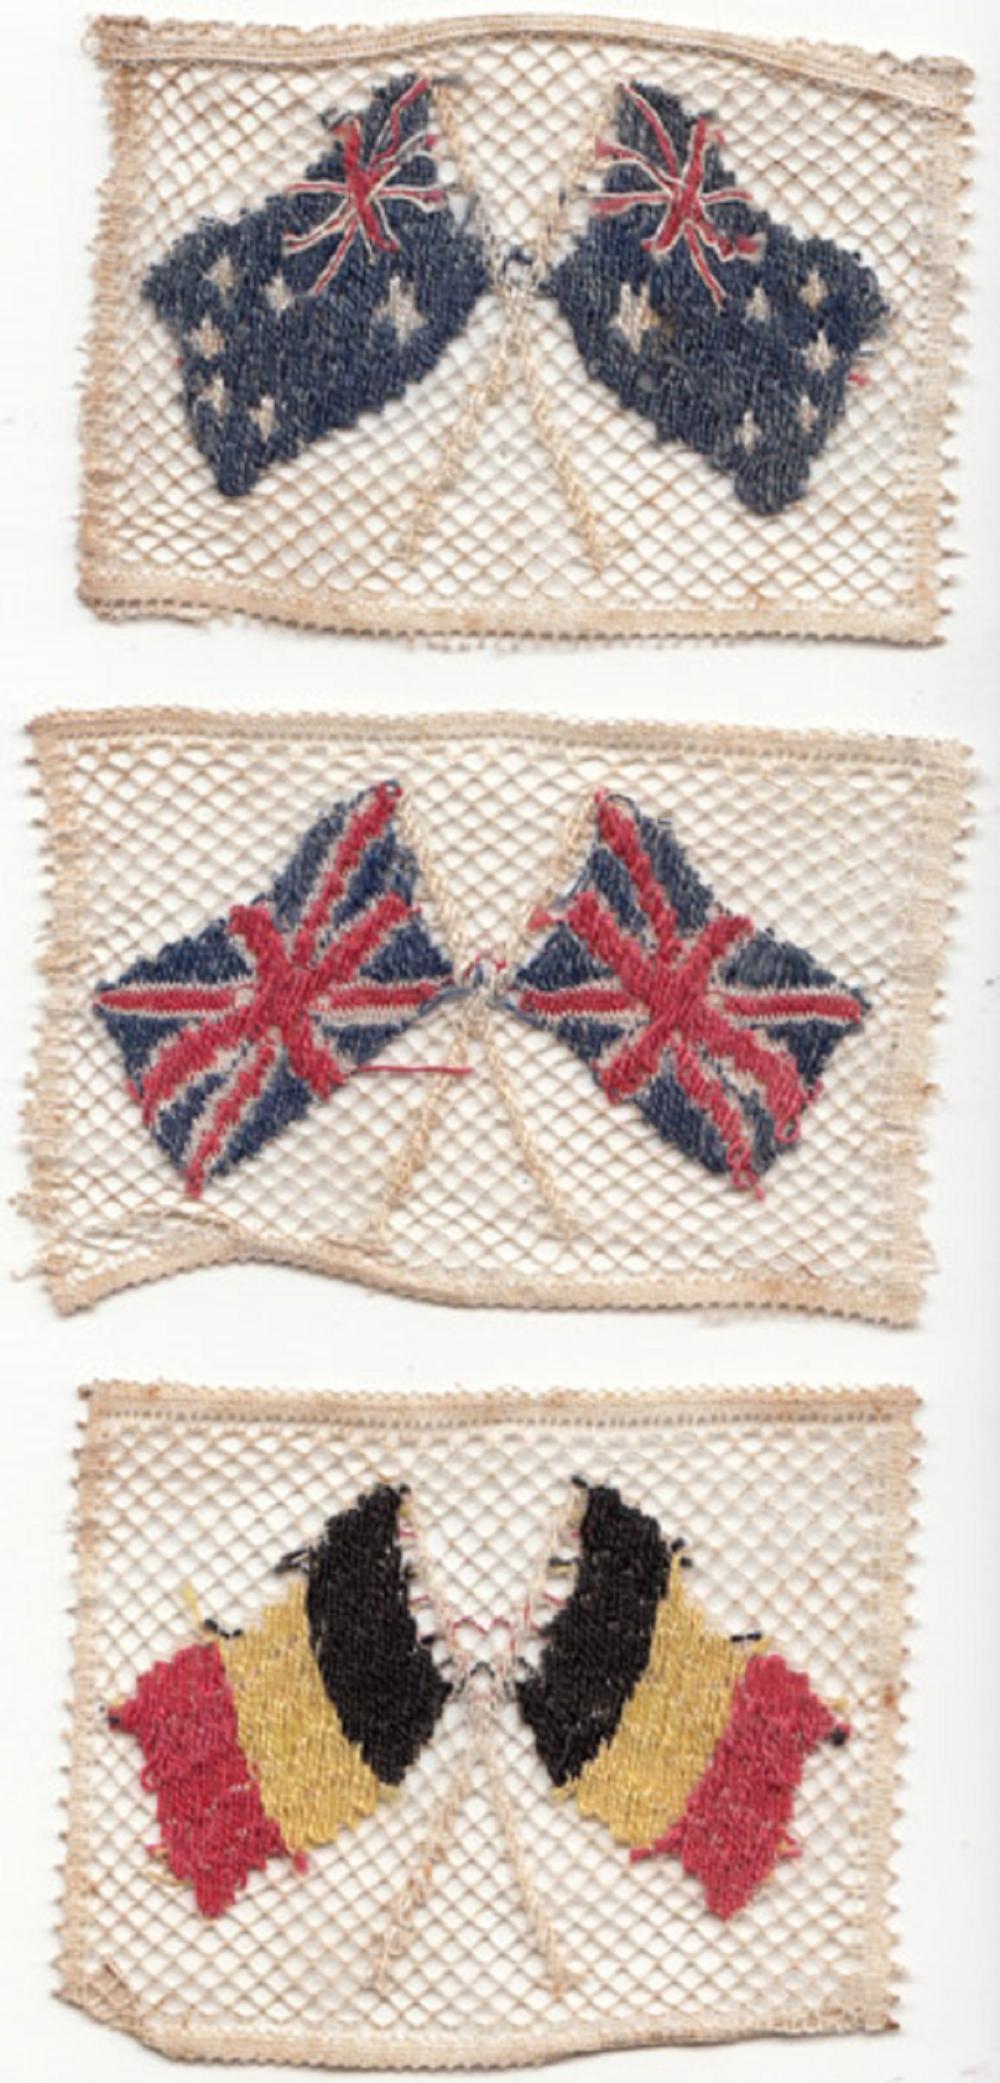 WWI. Vintage crocheted flags of Australia, Great Britain & Belgium (3 items)